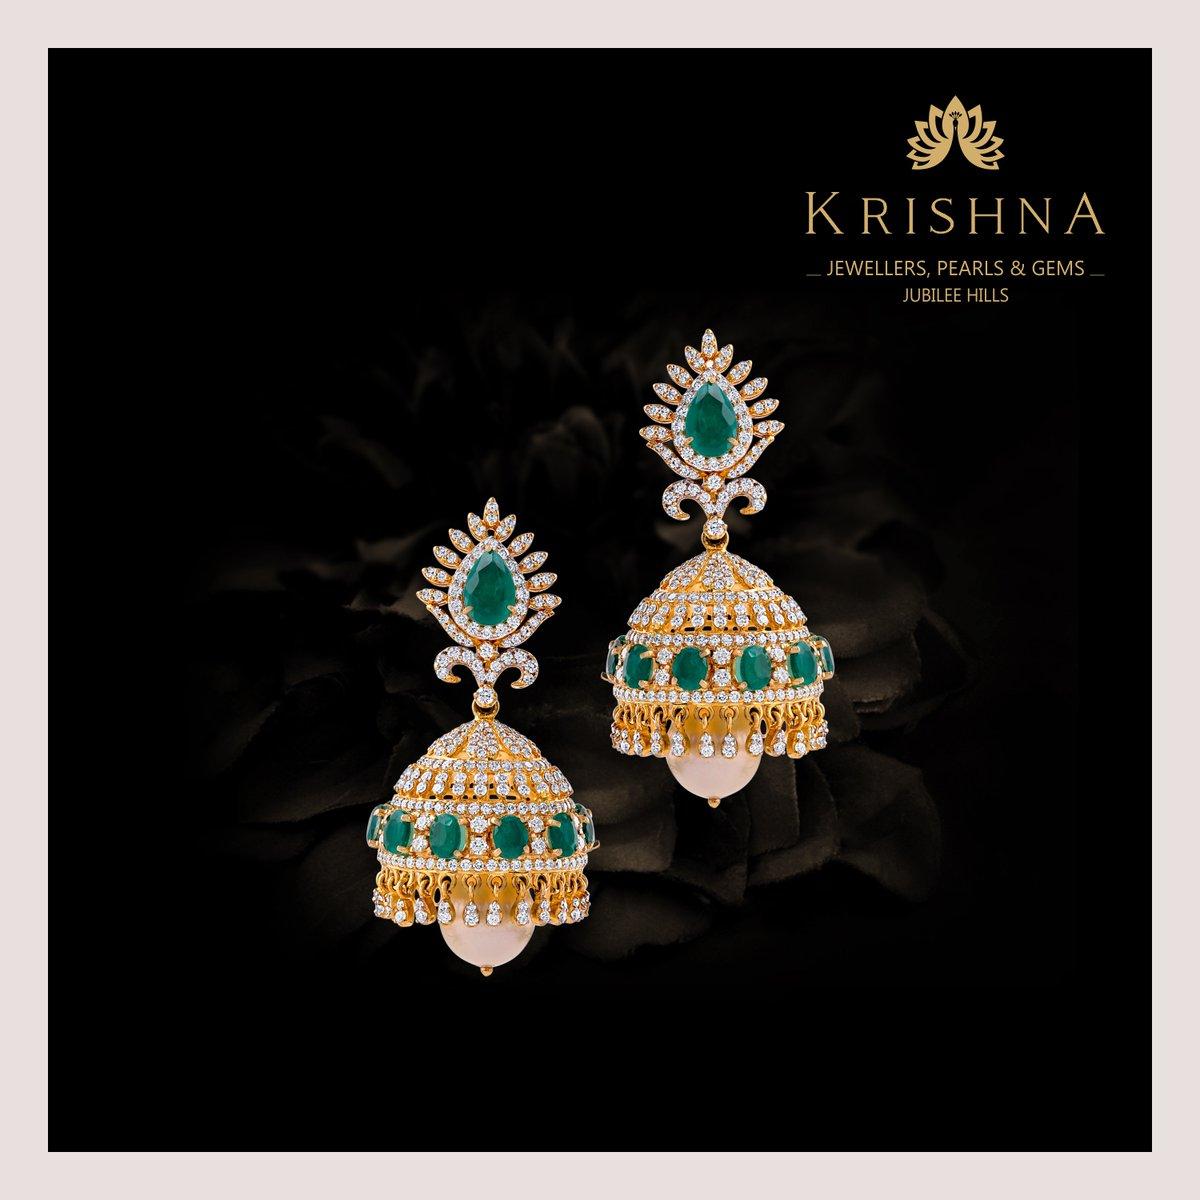 Wondrous diamond jhumka earrings fabricated in certified Diamonds, Emeralds, South sea pearls is perfect for marvellous feminine.  For more details Contact Us @ +91-7093324141. #diamondearrings #earrings #jhumkaearrings #diamonds #diamondjewellery #diamondjhumkaearrings #earringpic.twitter.com/ueyOGE9VKJ